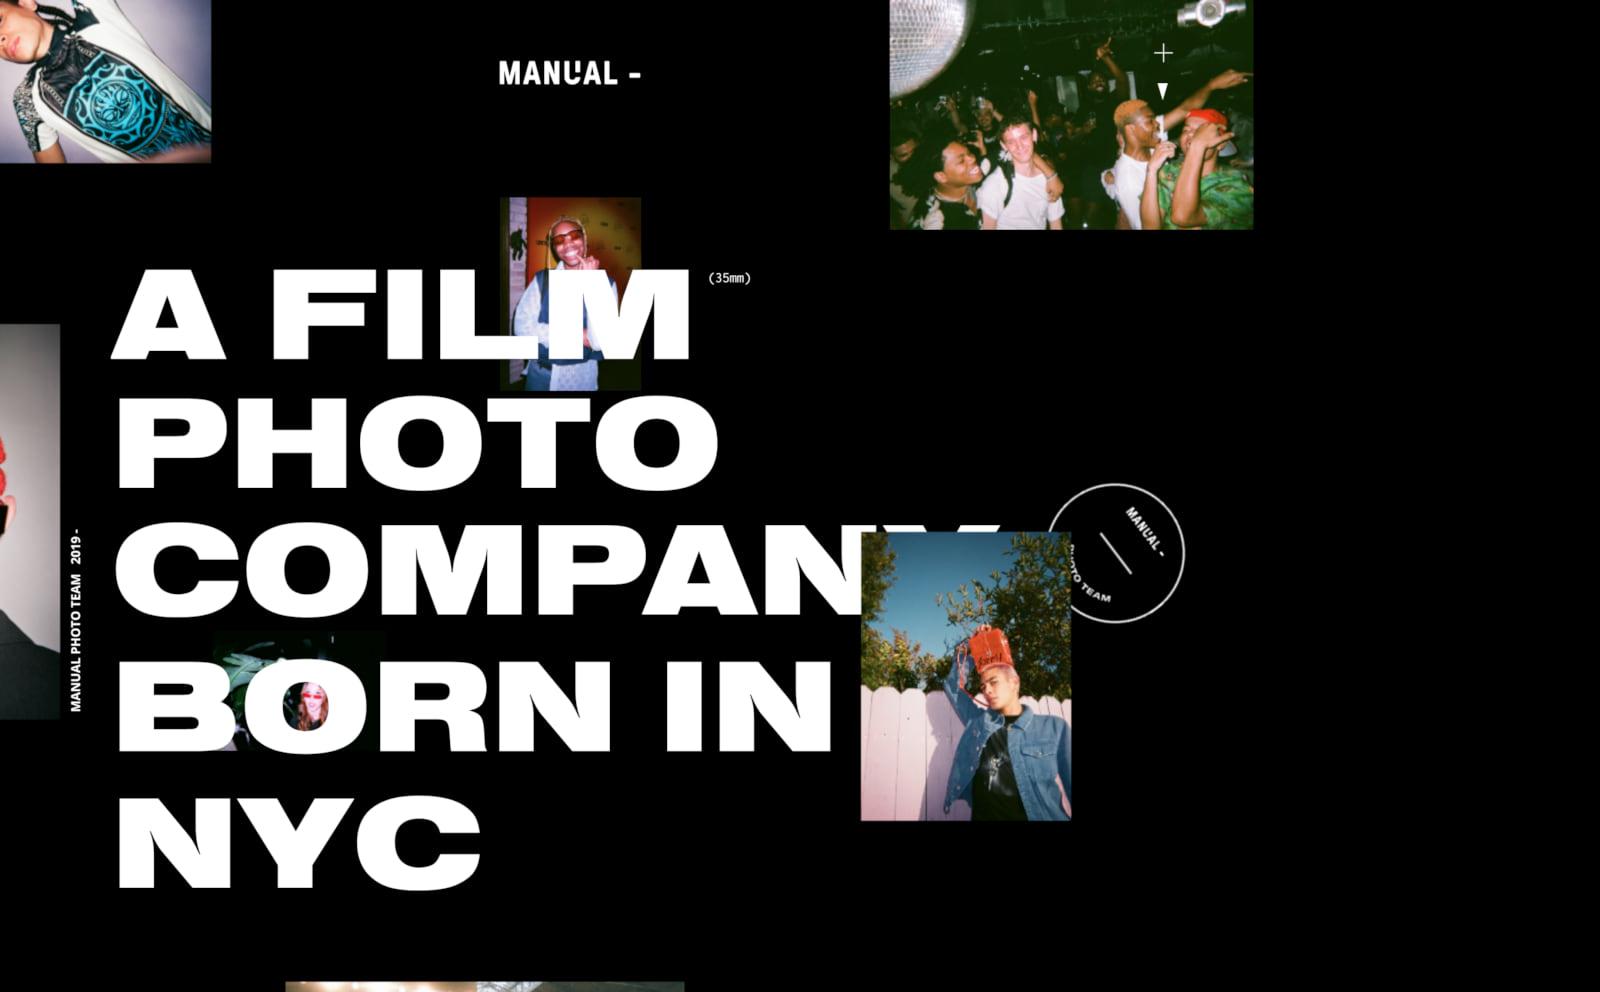 Manual Screenshot Thumbnail